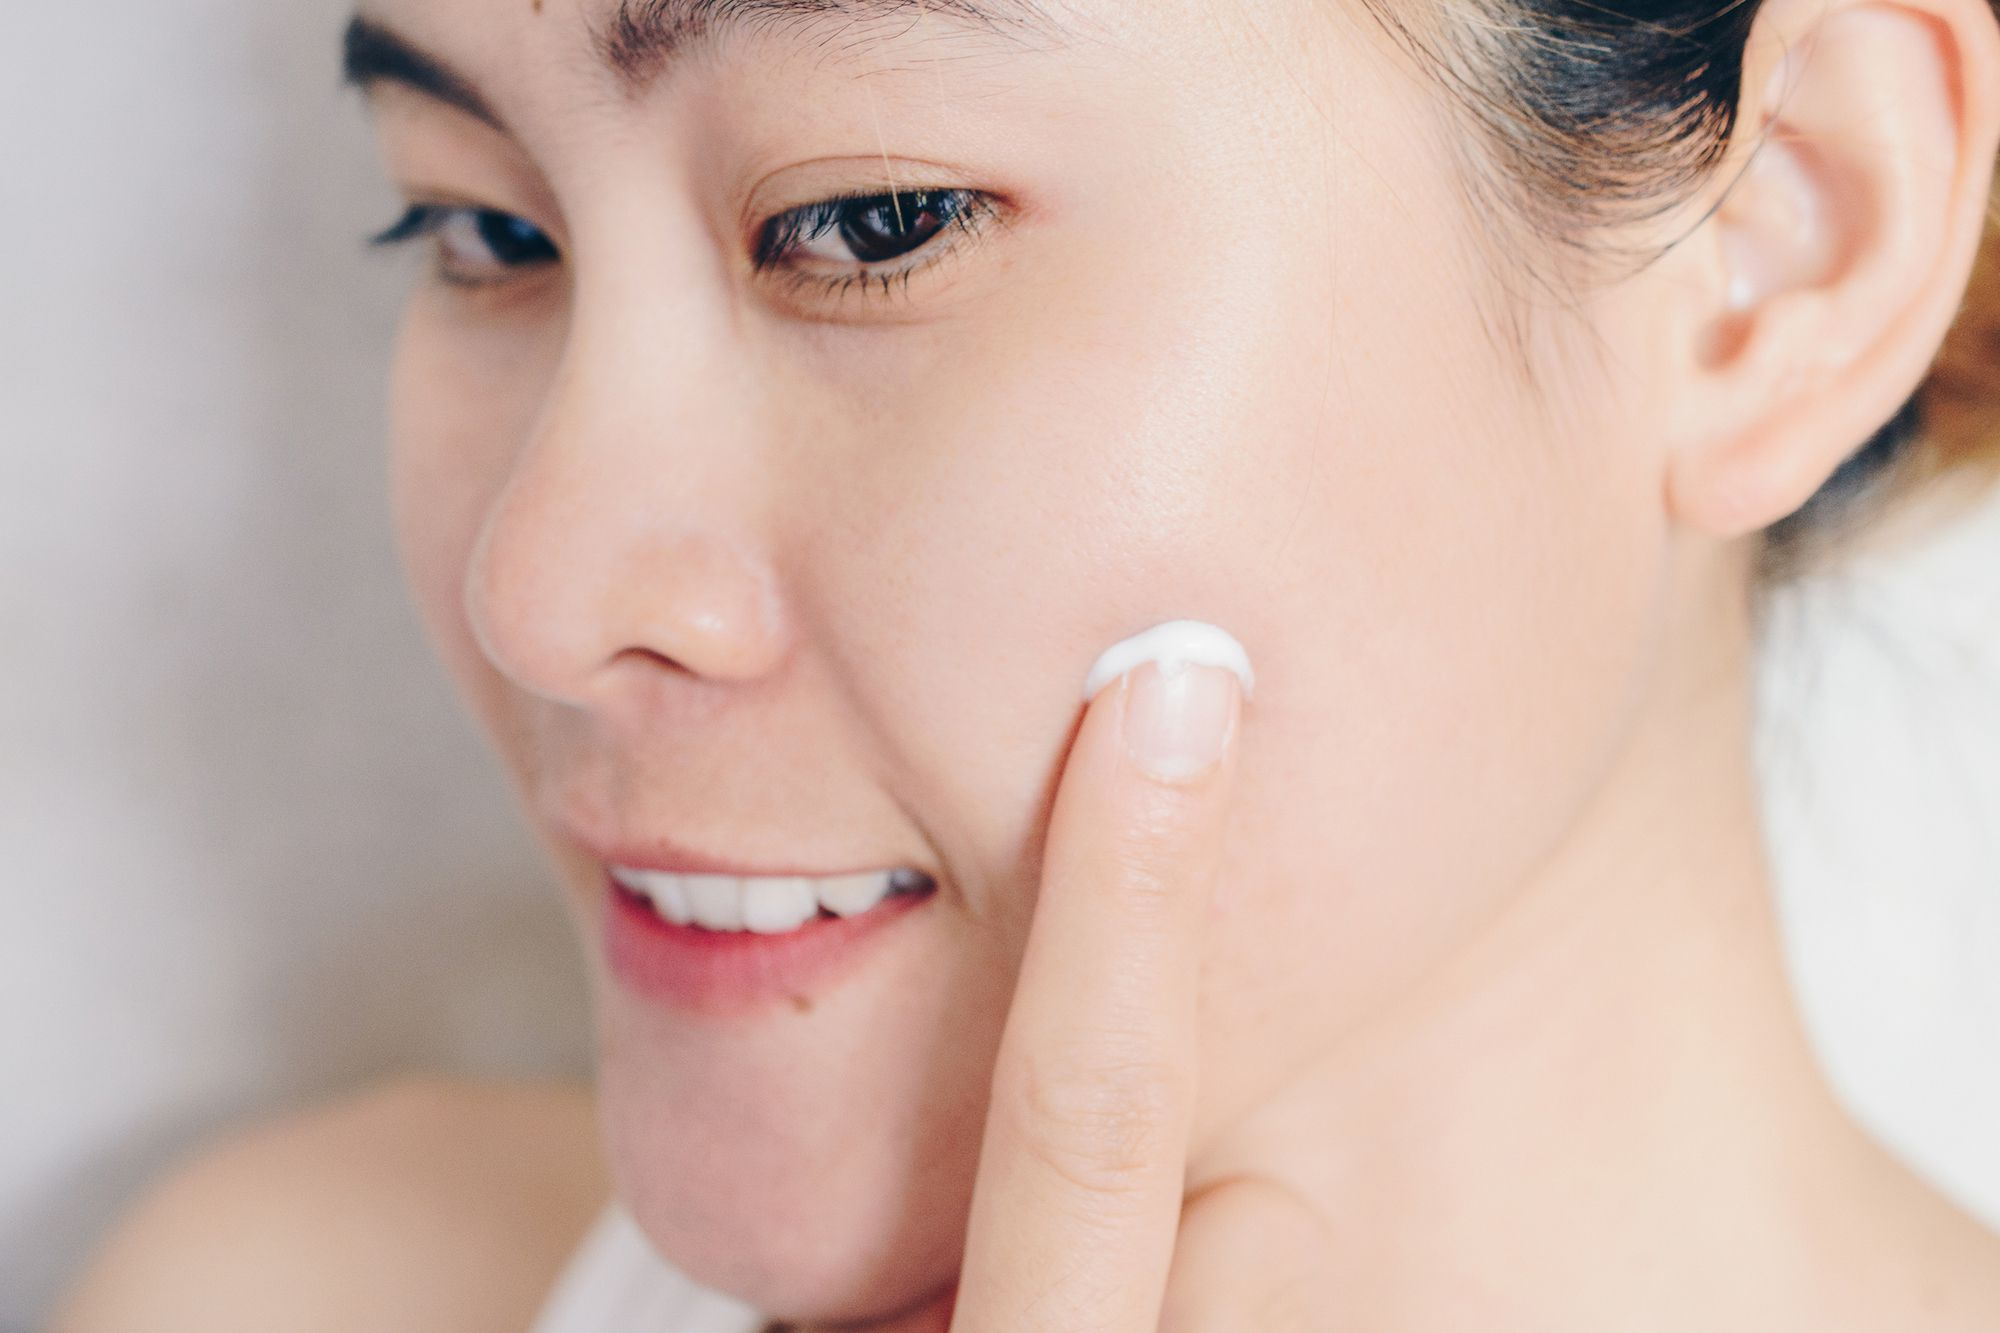 Topical Prescription Acne Treatments